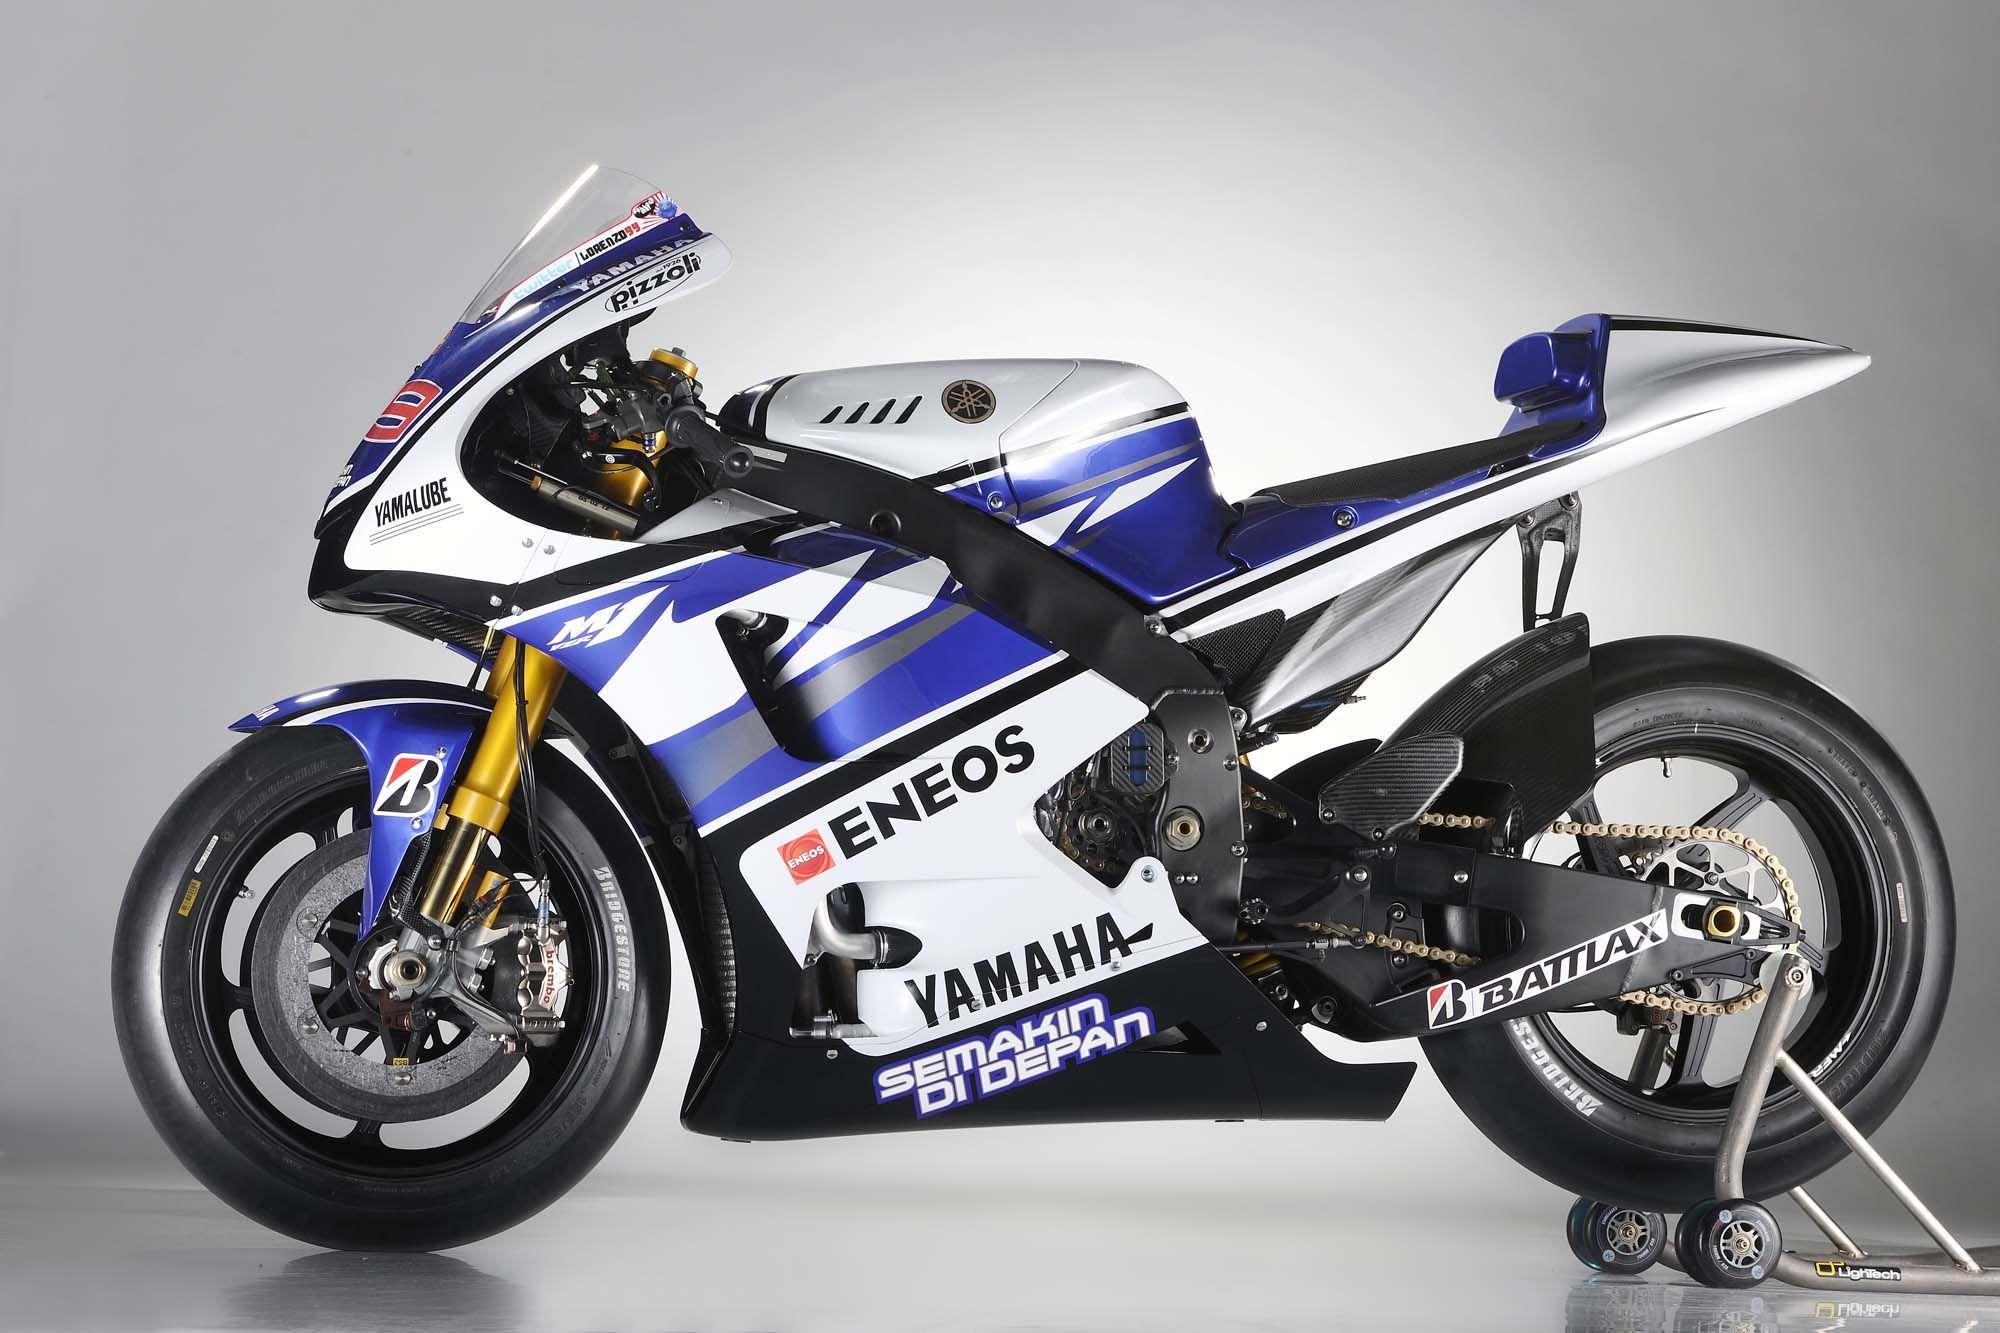 MotoGP Yamaha YZR M1 2013 46 Valentino Rossi Left Side HD